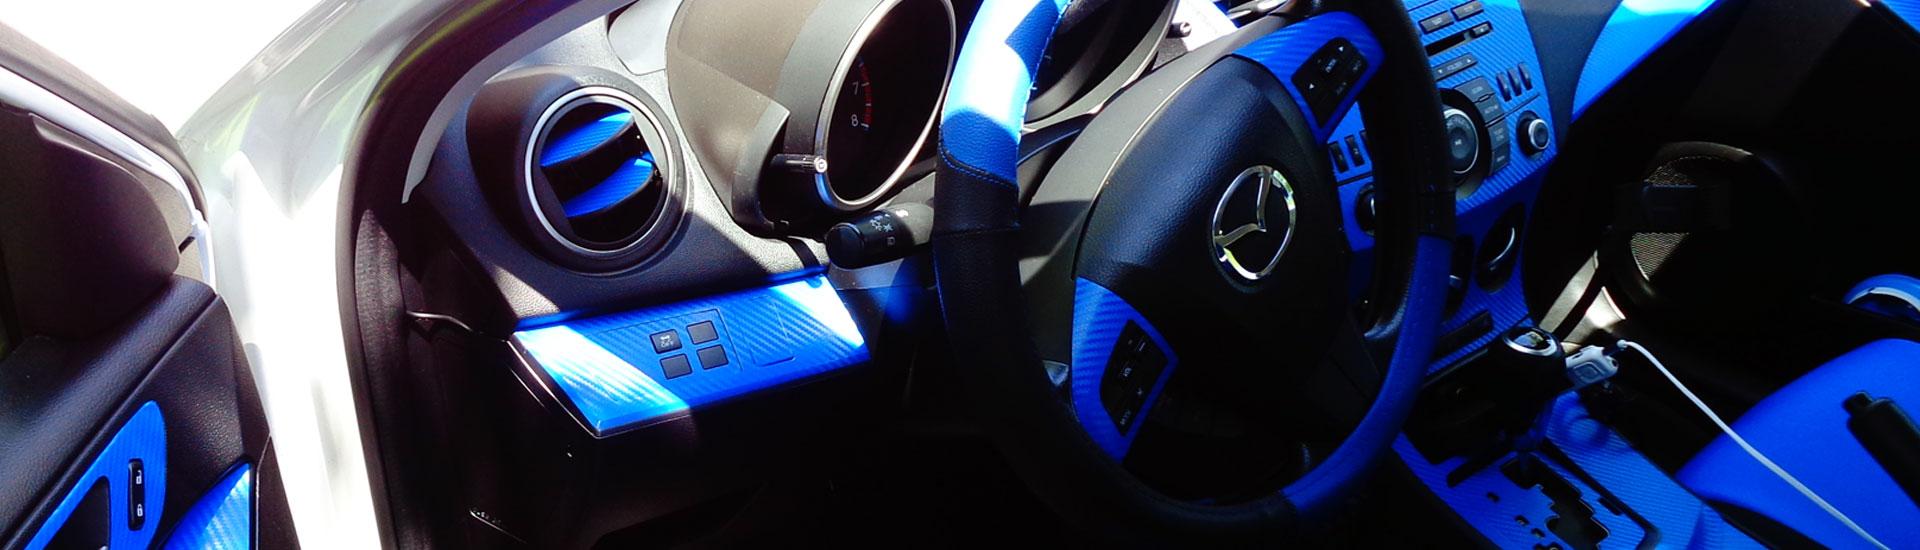 2017 mazda 3 blue light on dash